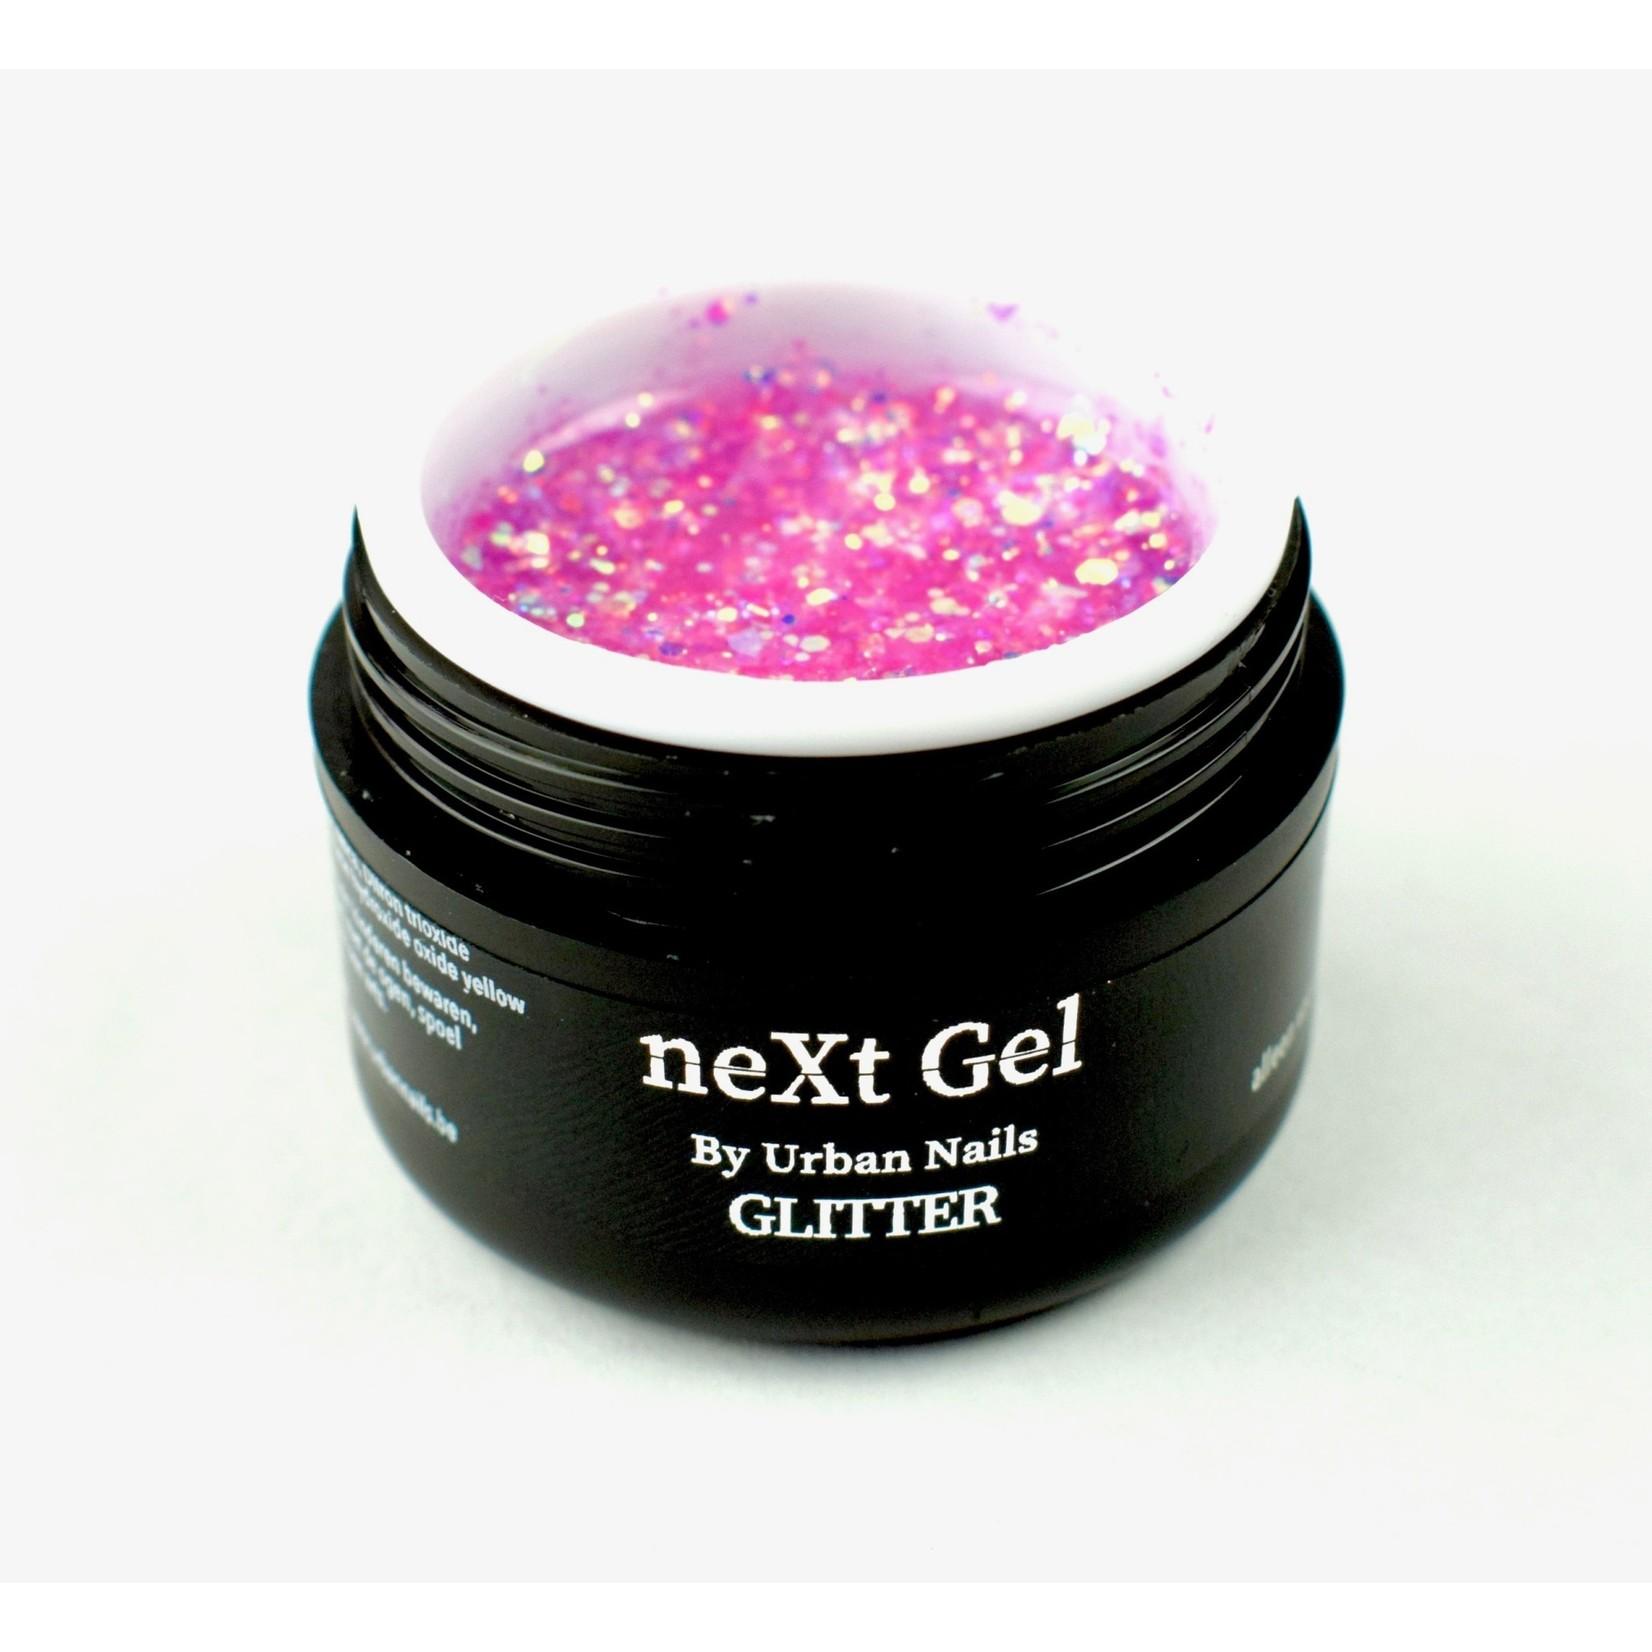 Urban Nails Next Gel Glitter Gel 05